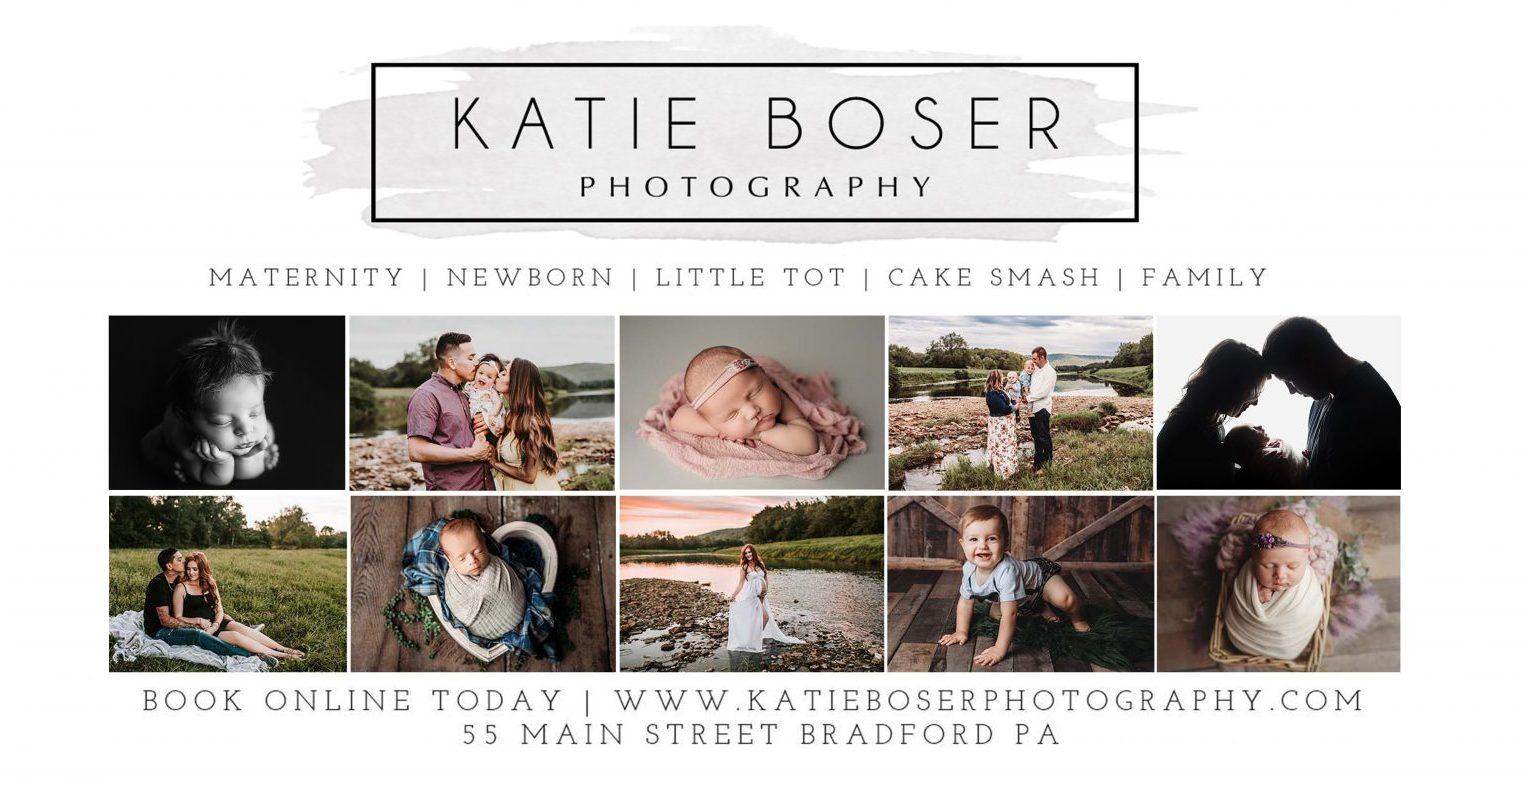 Katie Boser Photography | 55 Main Street BRADFORD PA